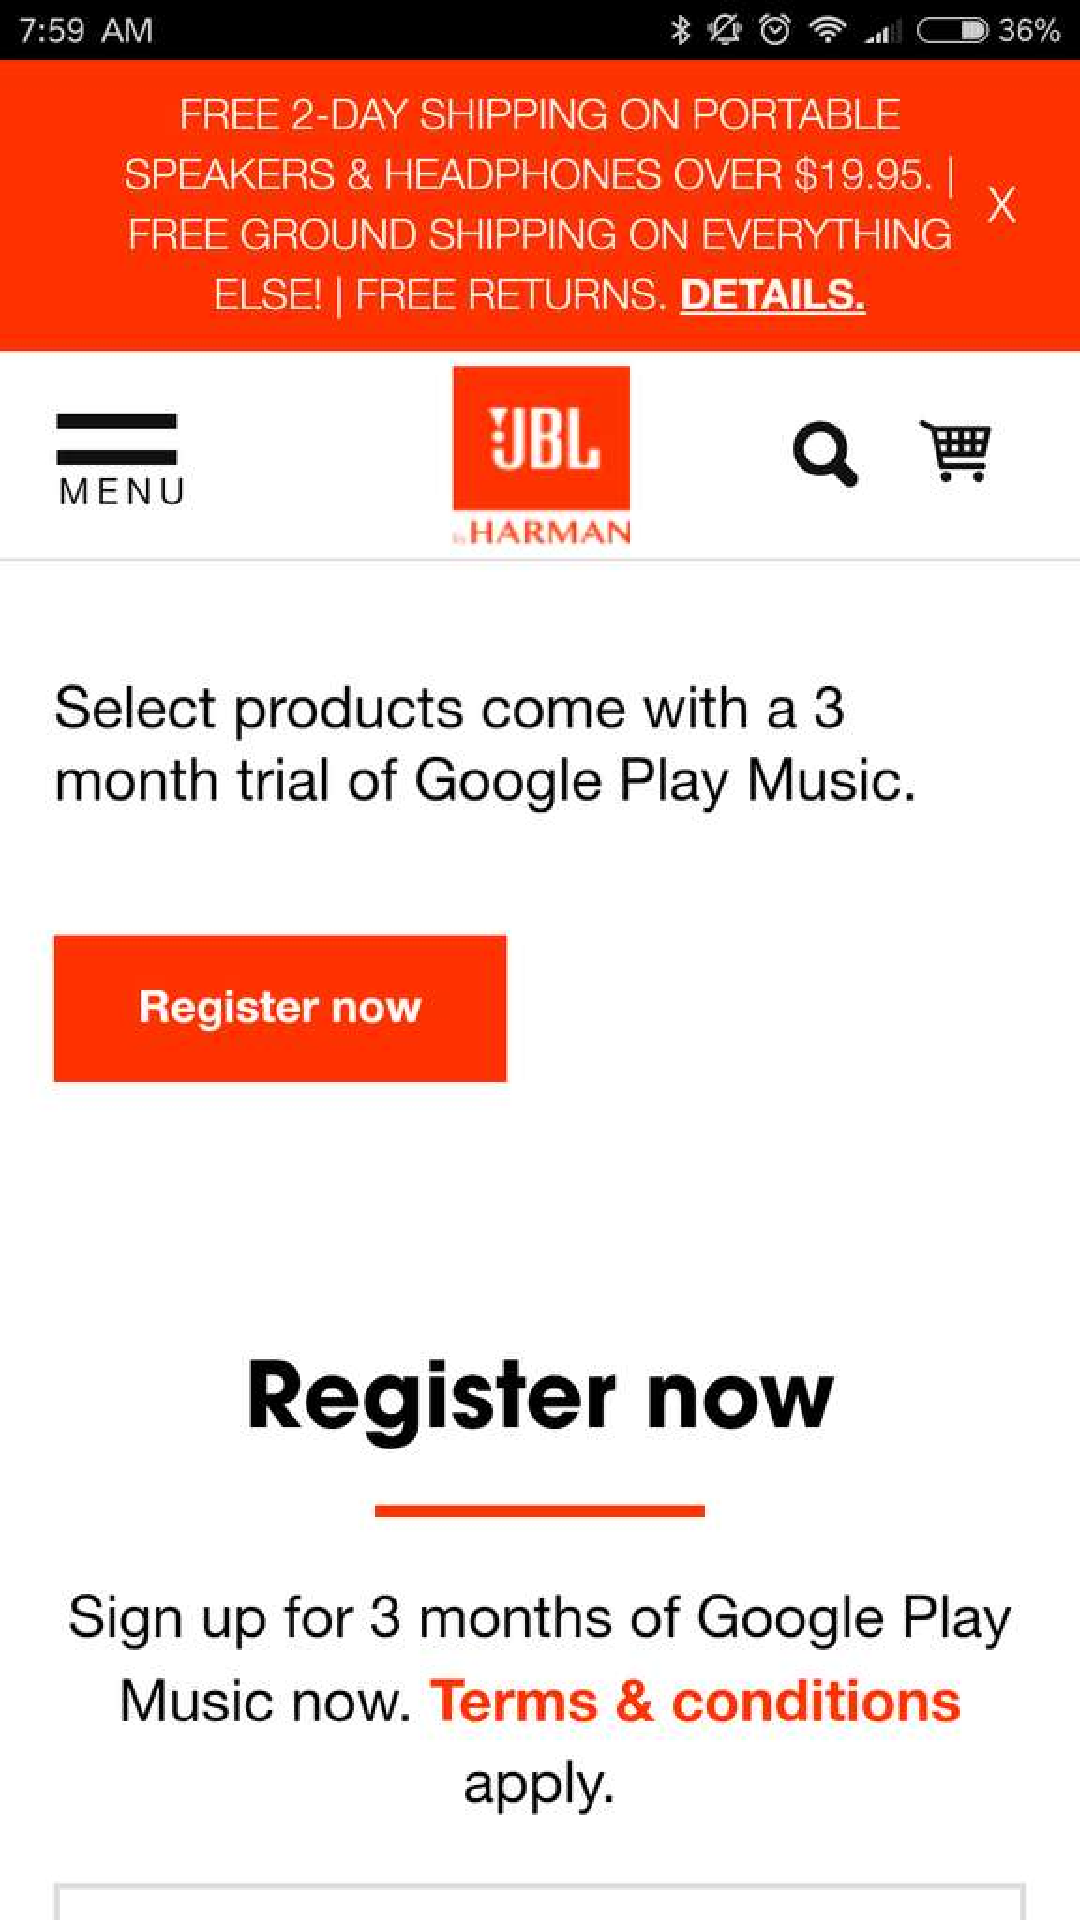 Google play music 3 months free at JBL - hotukdeals